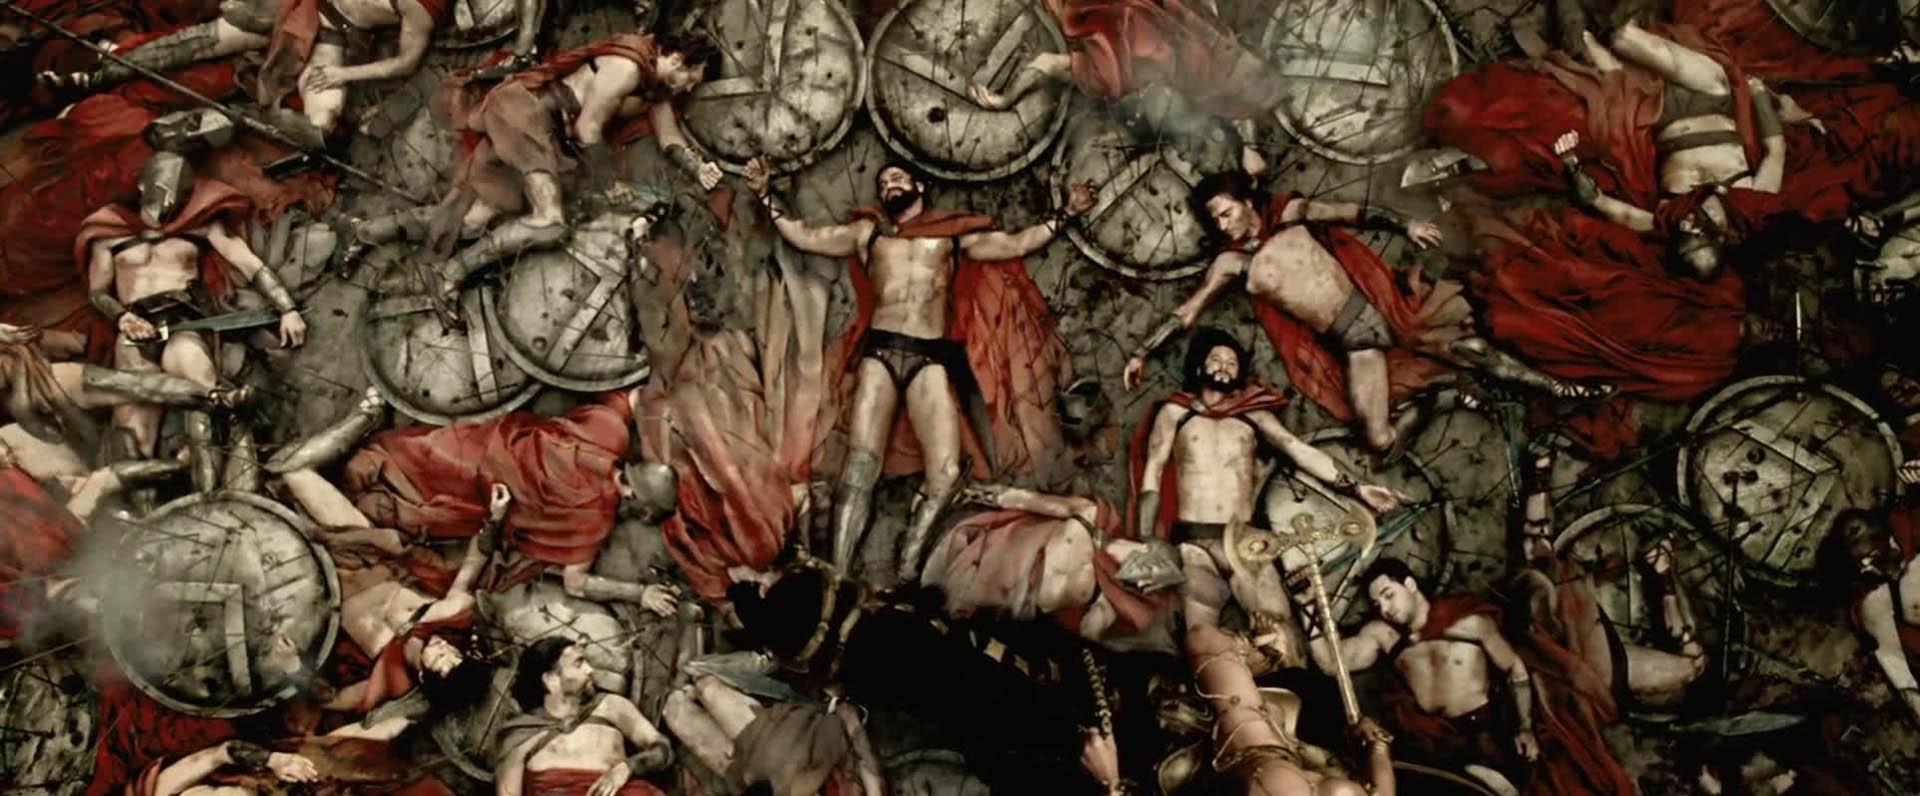 Смотреть фильм 300 спартанцев битва при артемисии онлайн